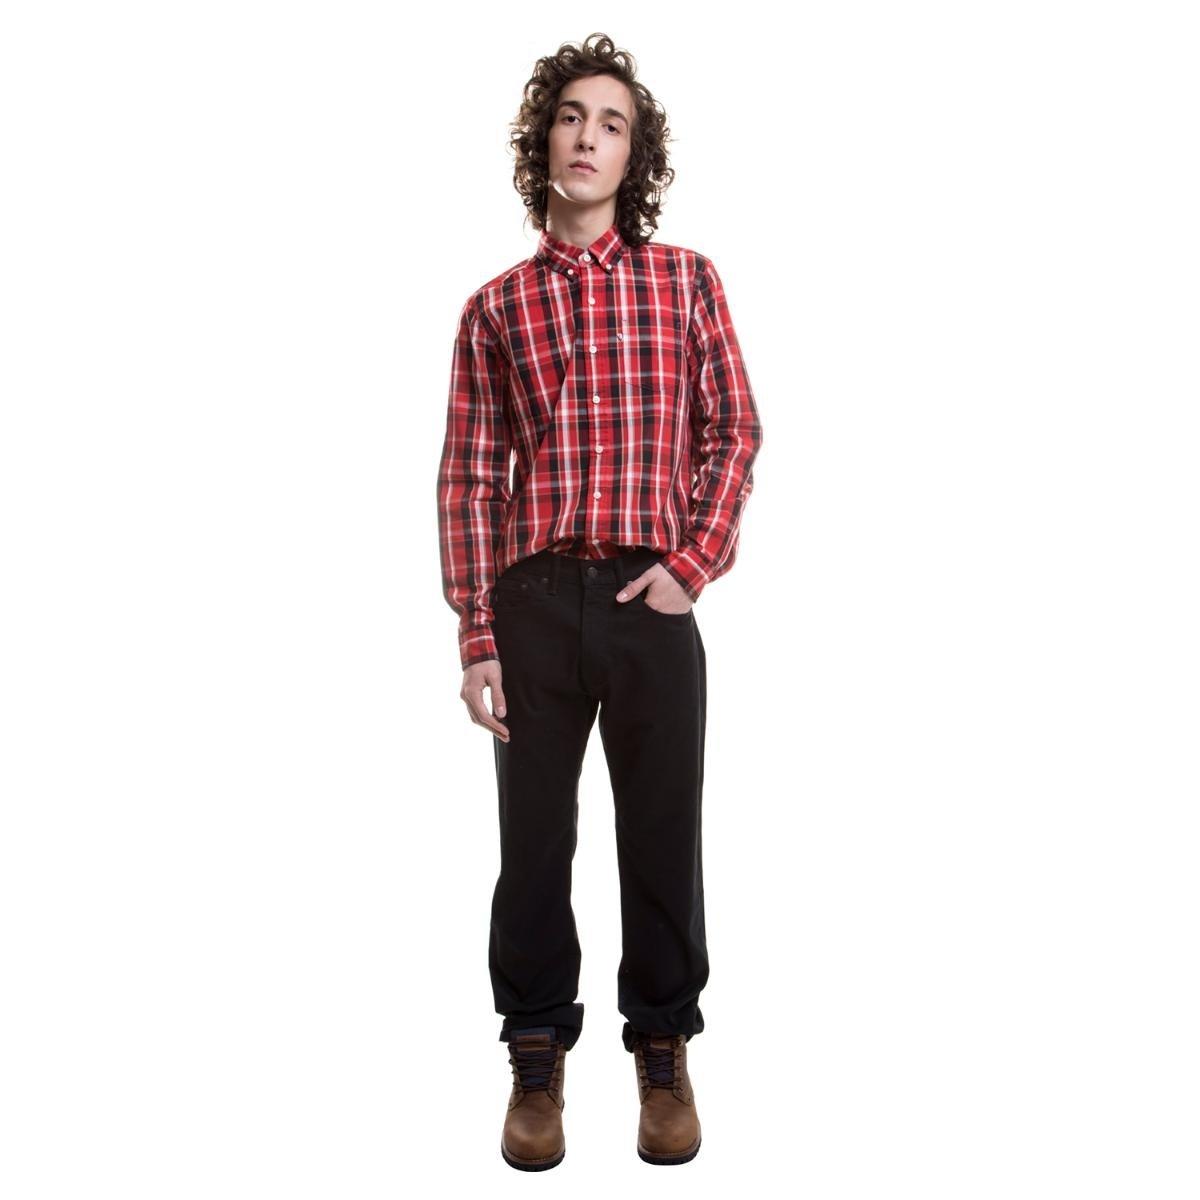 e9d2d61d03dfb Calça Jeans Levis Masculino 505 Regular - Preto - Compre Agora